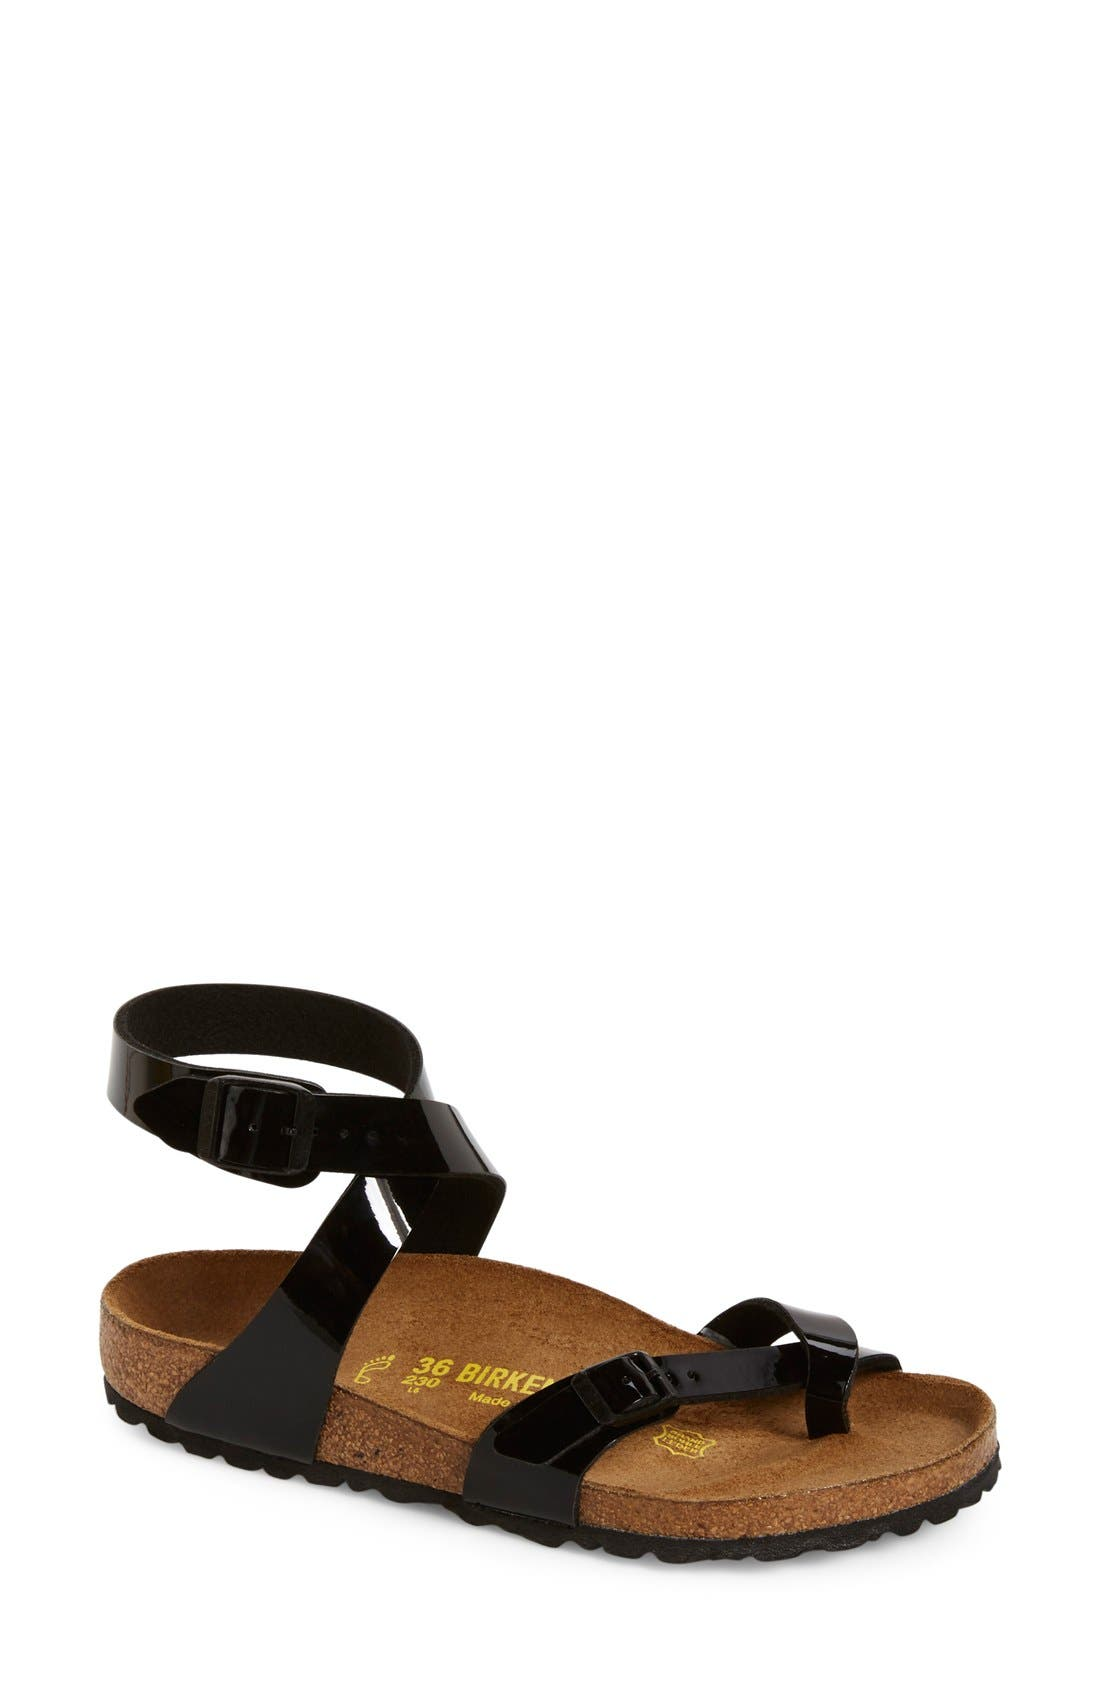 Main Image - Birkenstock 'Yara' Birko-Flor™ Ankle Strap Sandal (Women)